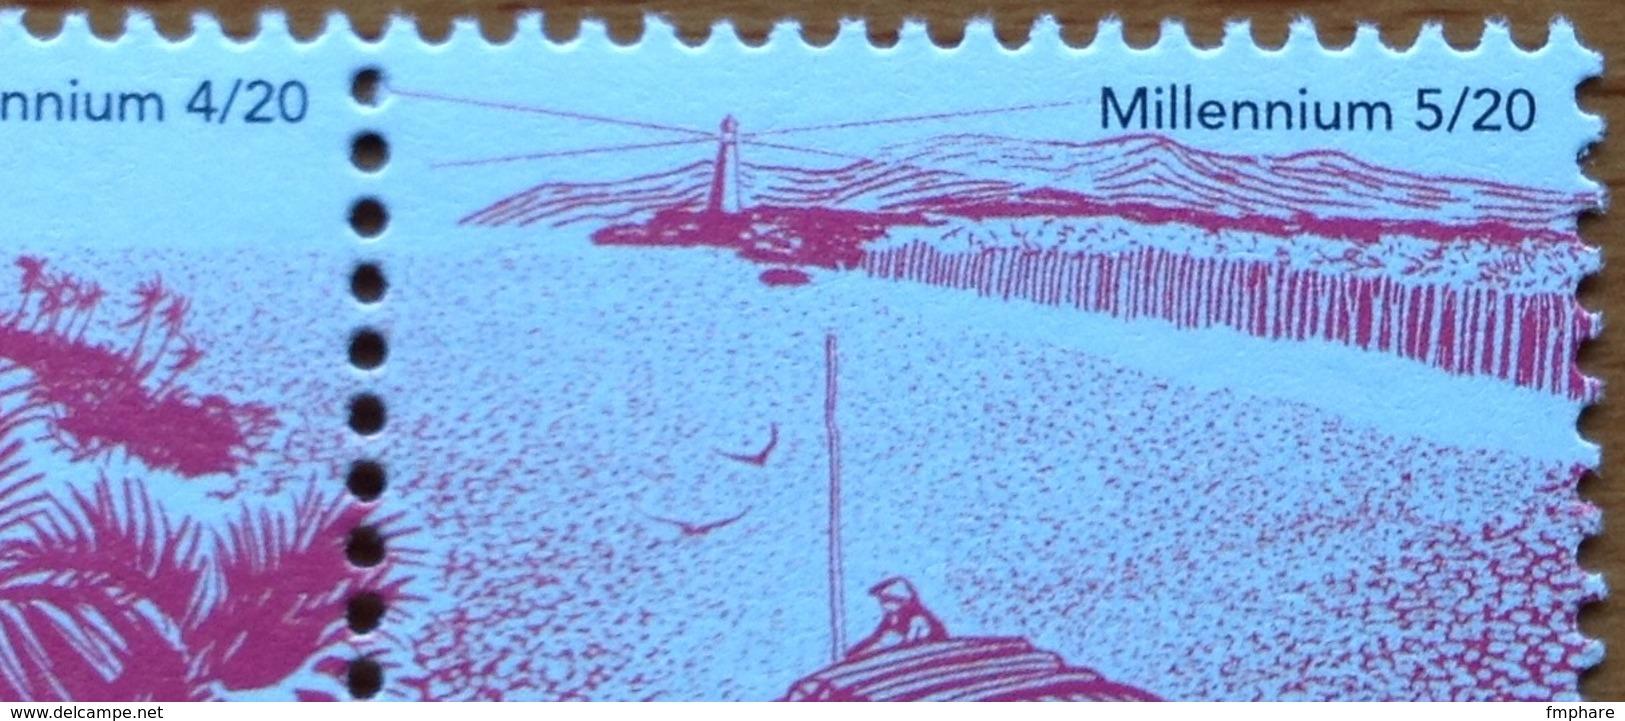 Phare Lighthouse Vuurtoren Leuchttürme Faro Fari MALAISIE 1 à 10/20 NEUF** MNH - Phares